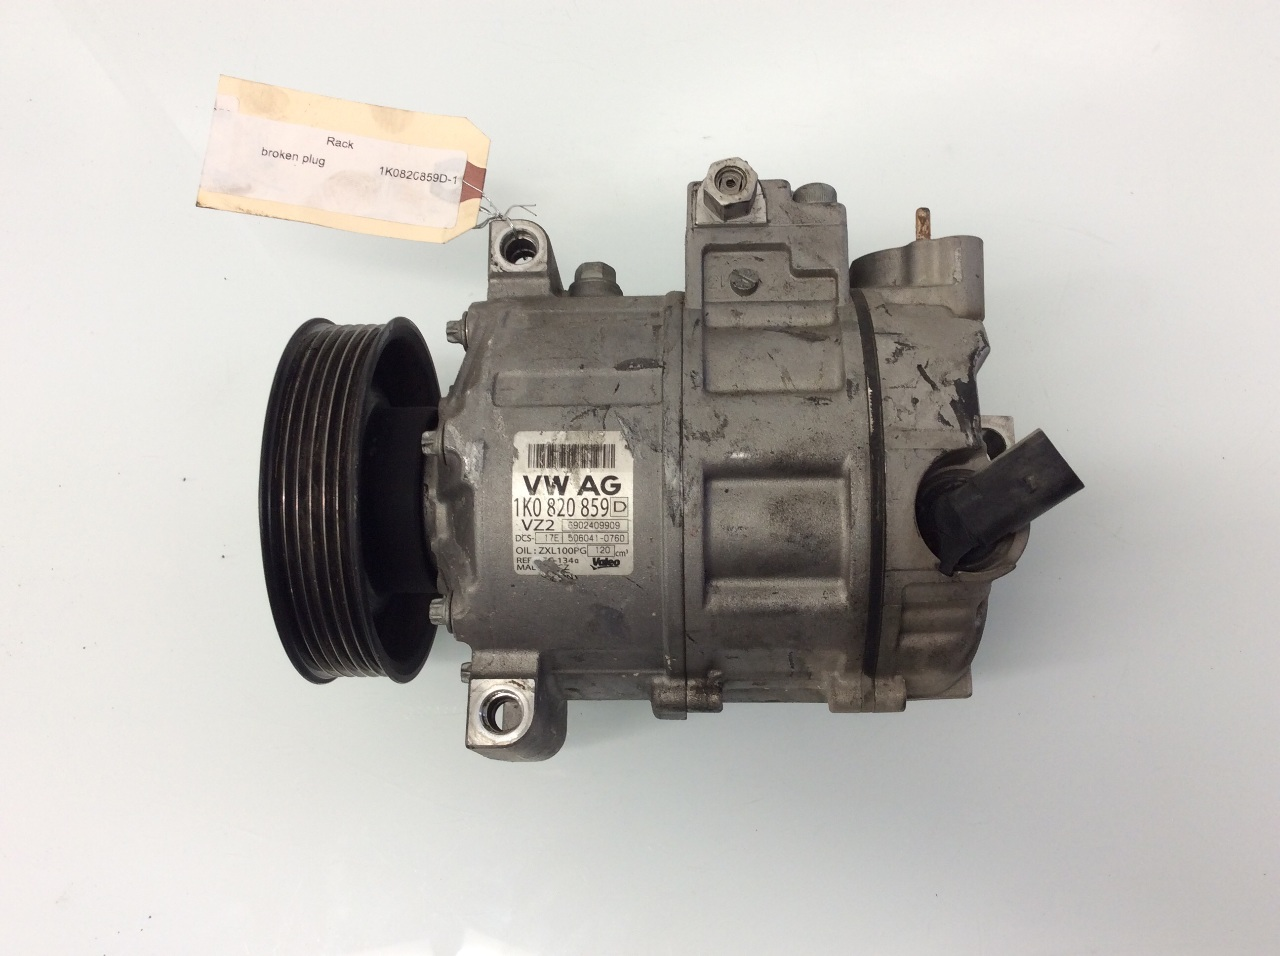 Volkswagen Jetta Tiguan Passat Eos Audi A3 AC Compressor 1K0820859D Broken Plug